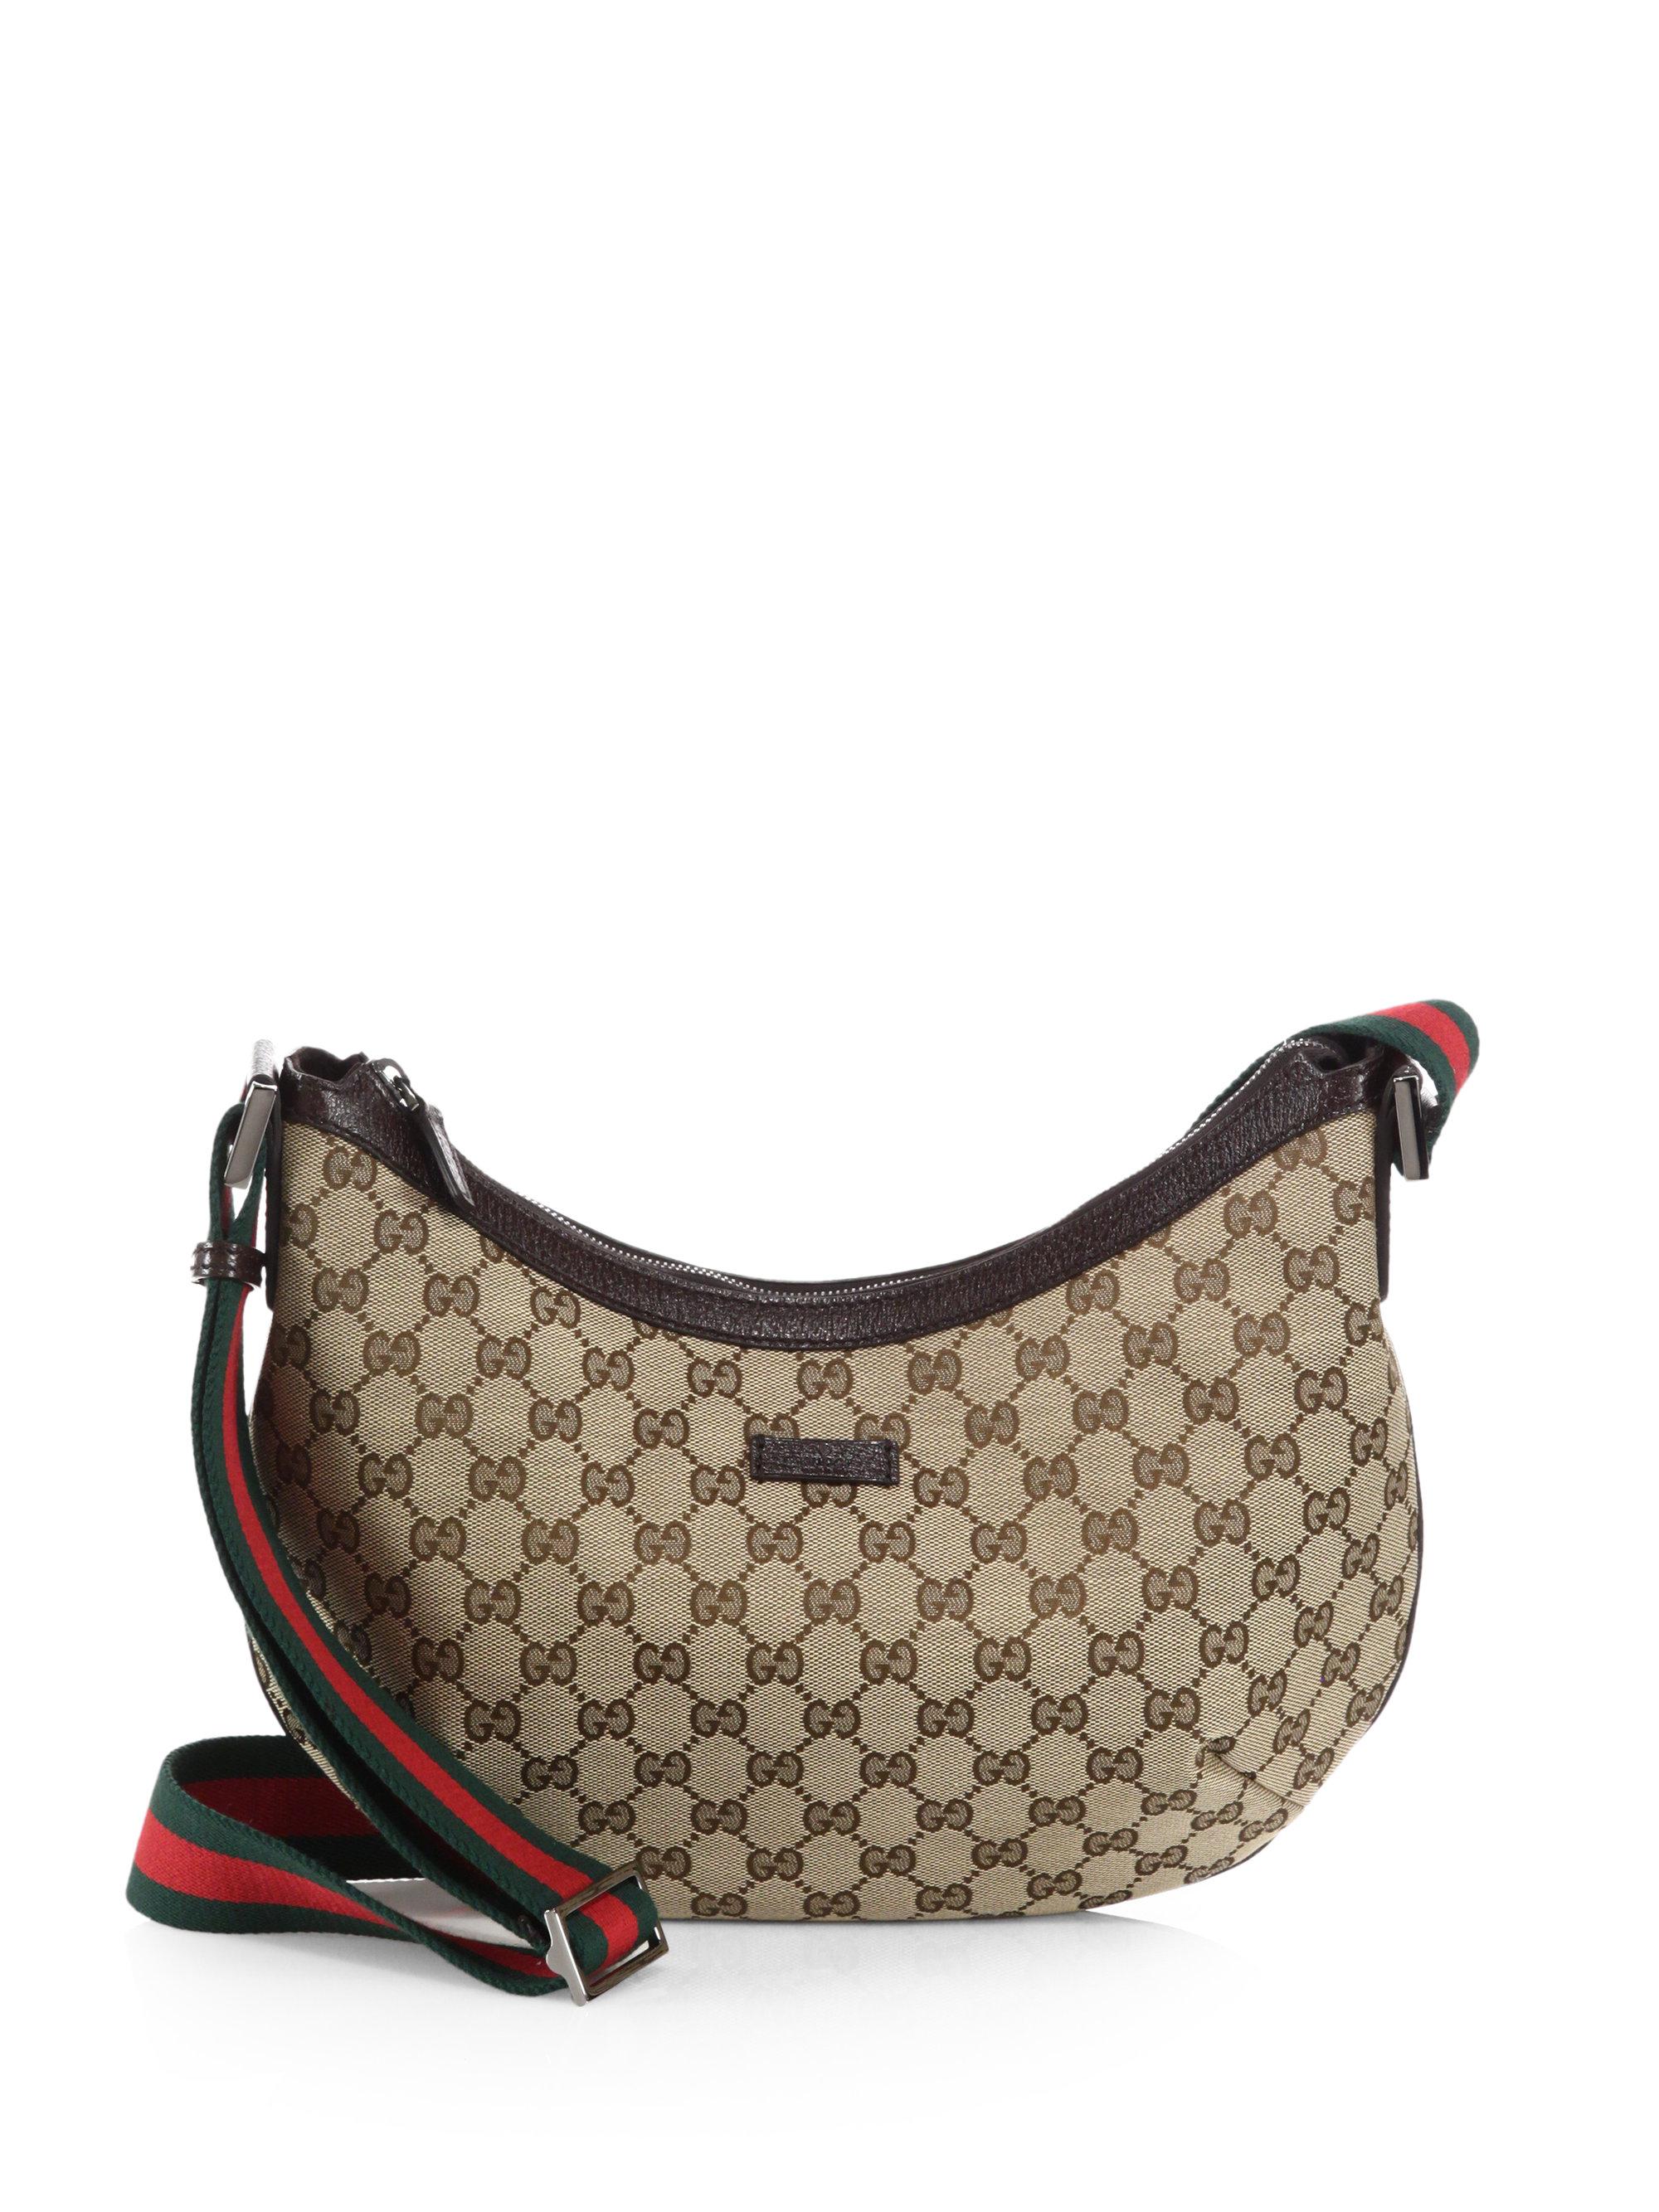 Lyst Gucci Original Gg Canvas Messenger Bag In Brown